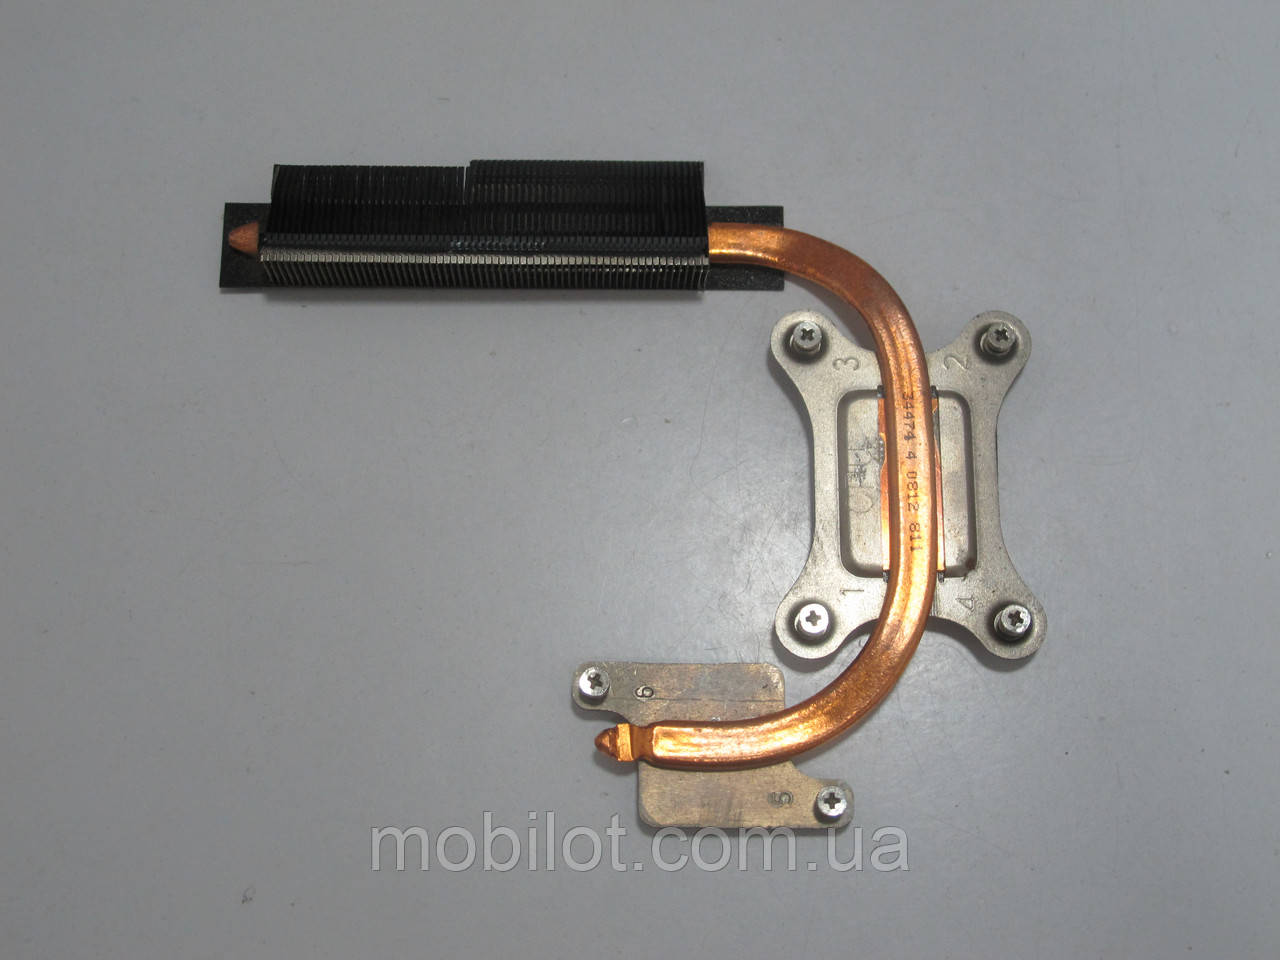 Система охлаждения Samsung RV509 (NZ-6561)